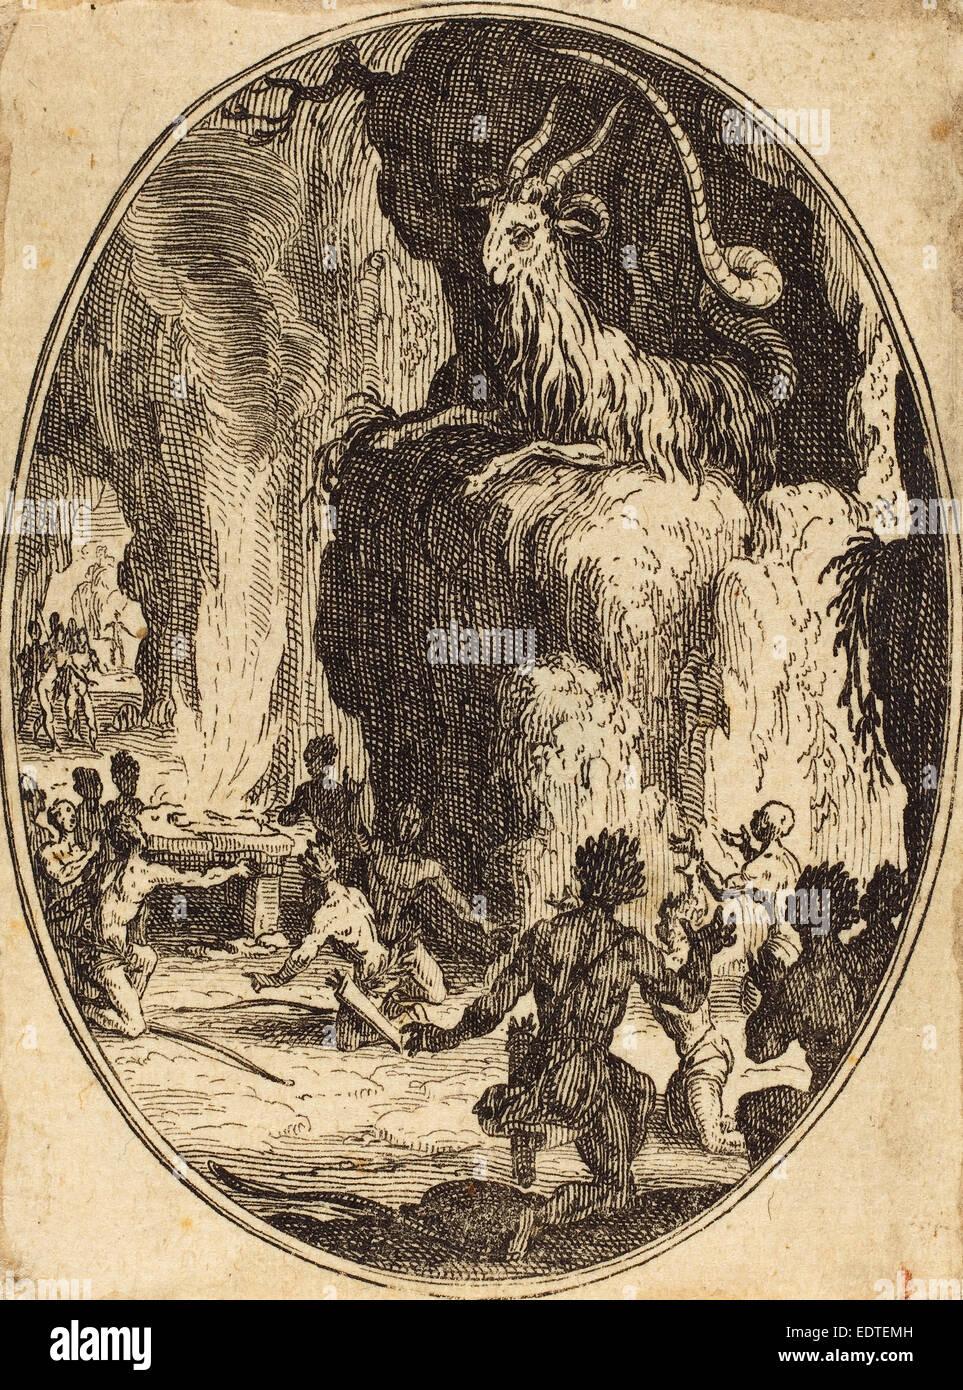 Jacques Callot (Französisch, 1592-1635), The Cult des Dämons, vermutlich 1627, Radierung Stockbild